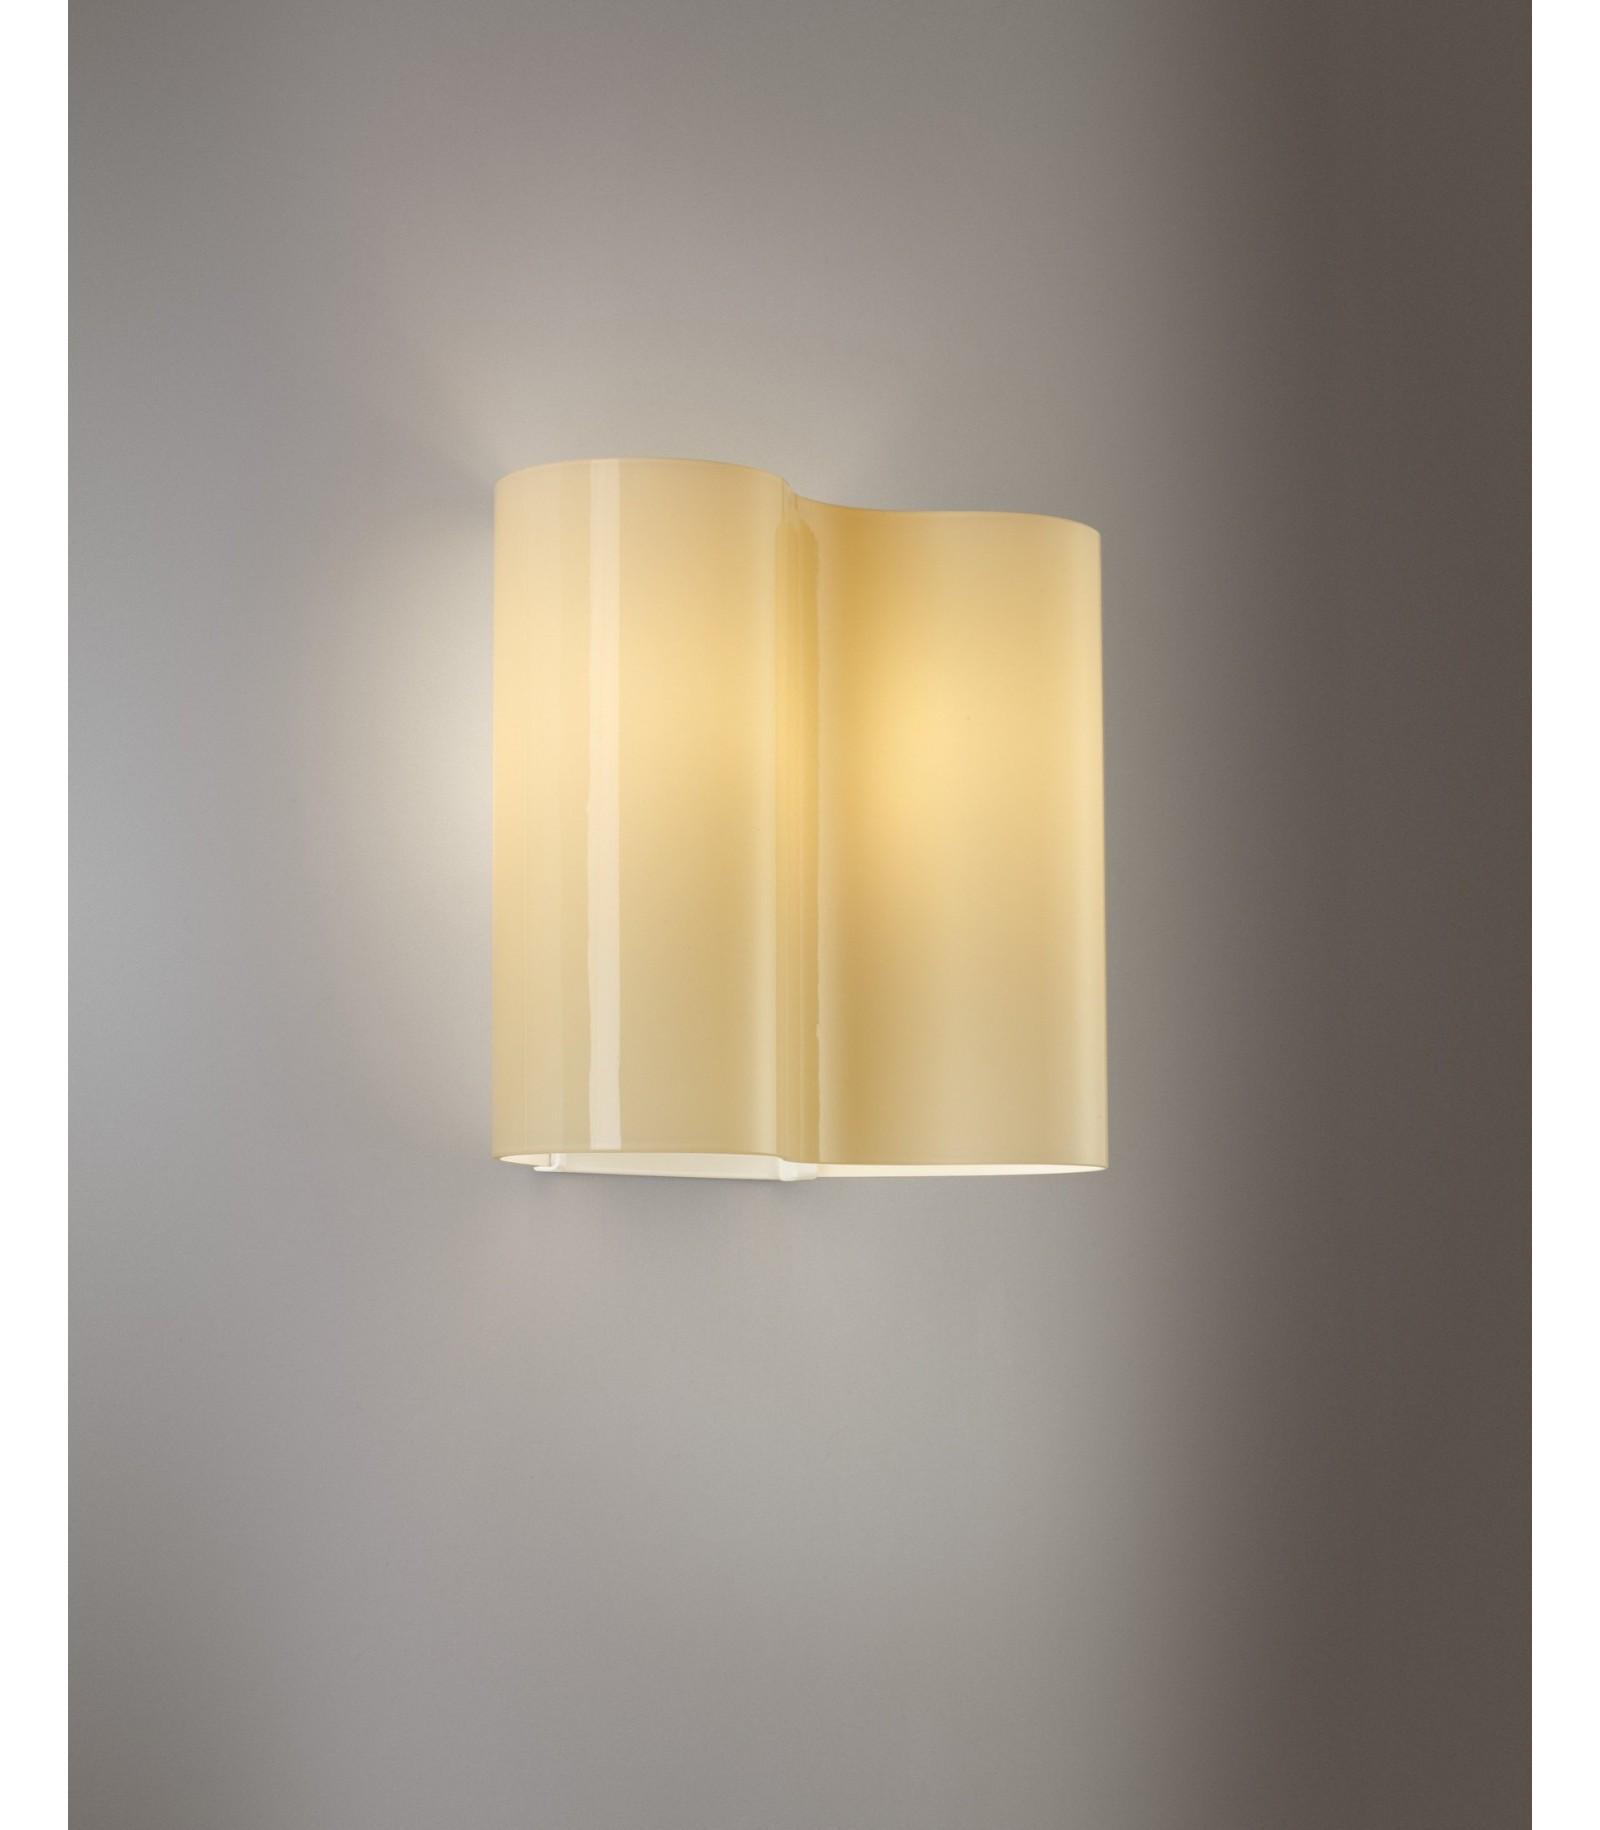 Lampada da parete foscarini double 07 - Lampada parete design ...